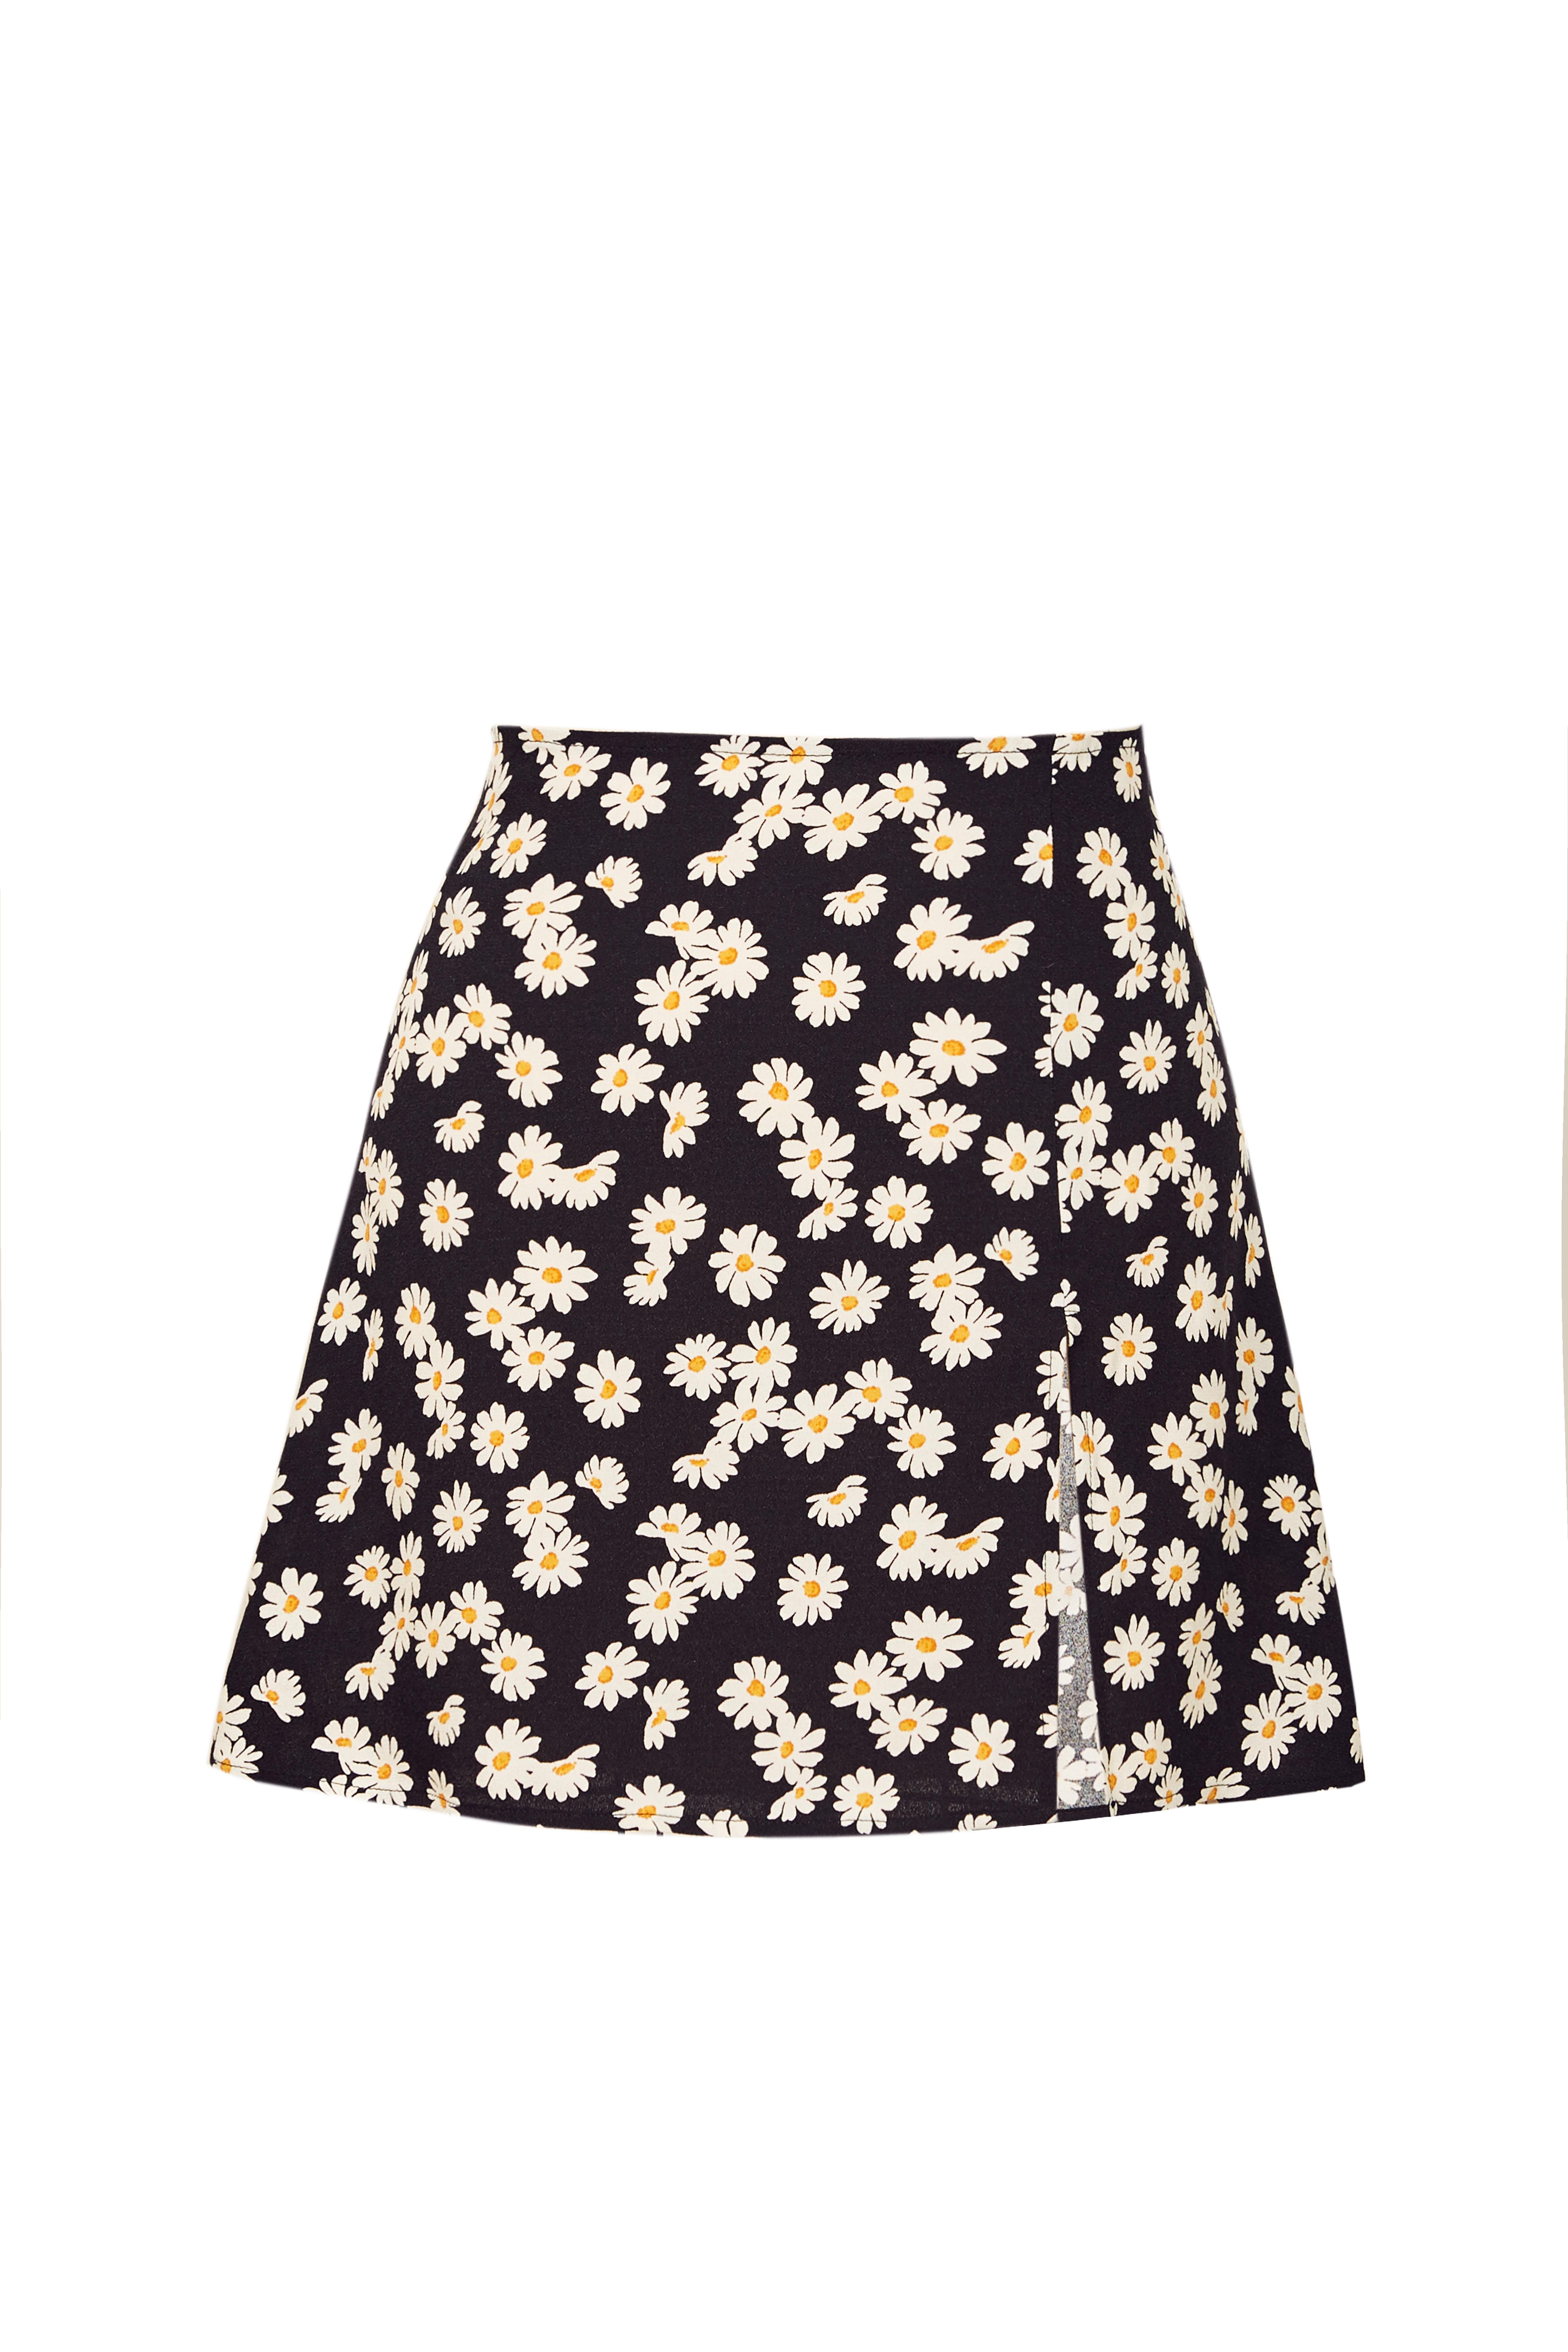 Margot_skirt_daisy_chain